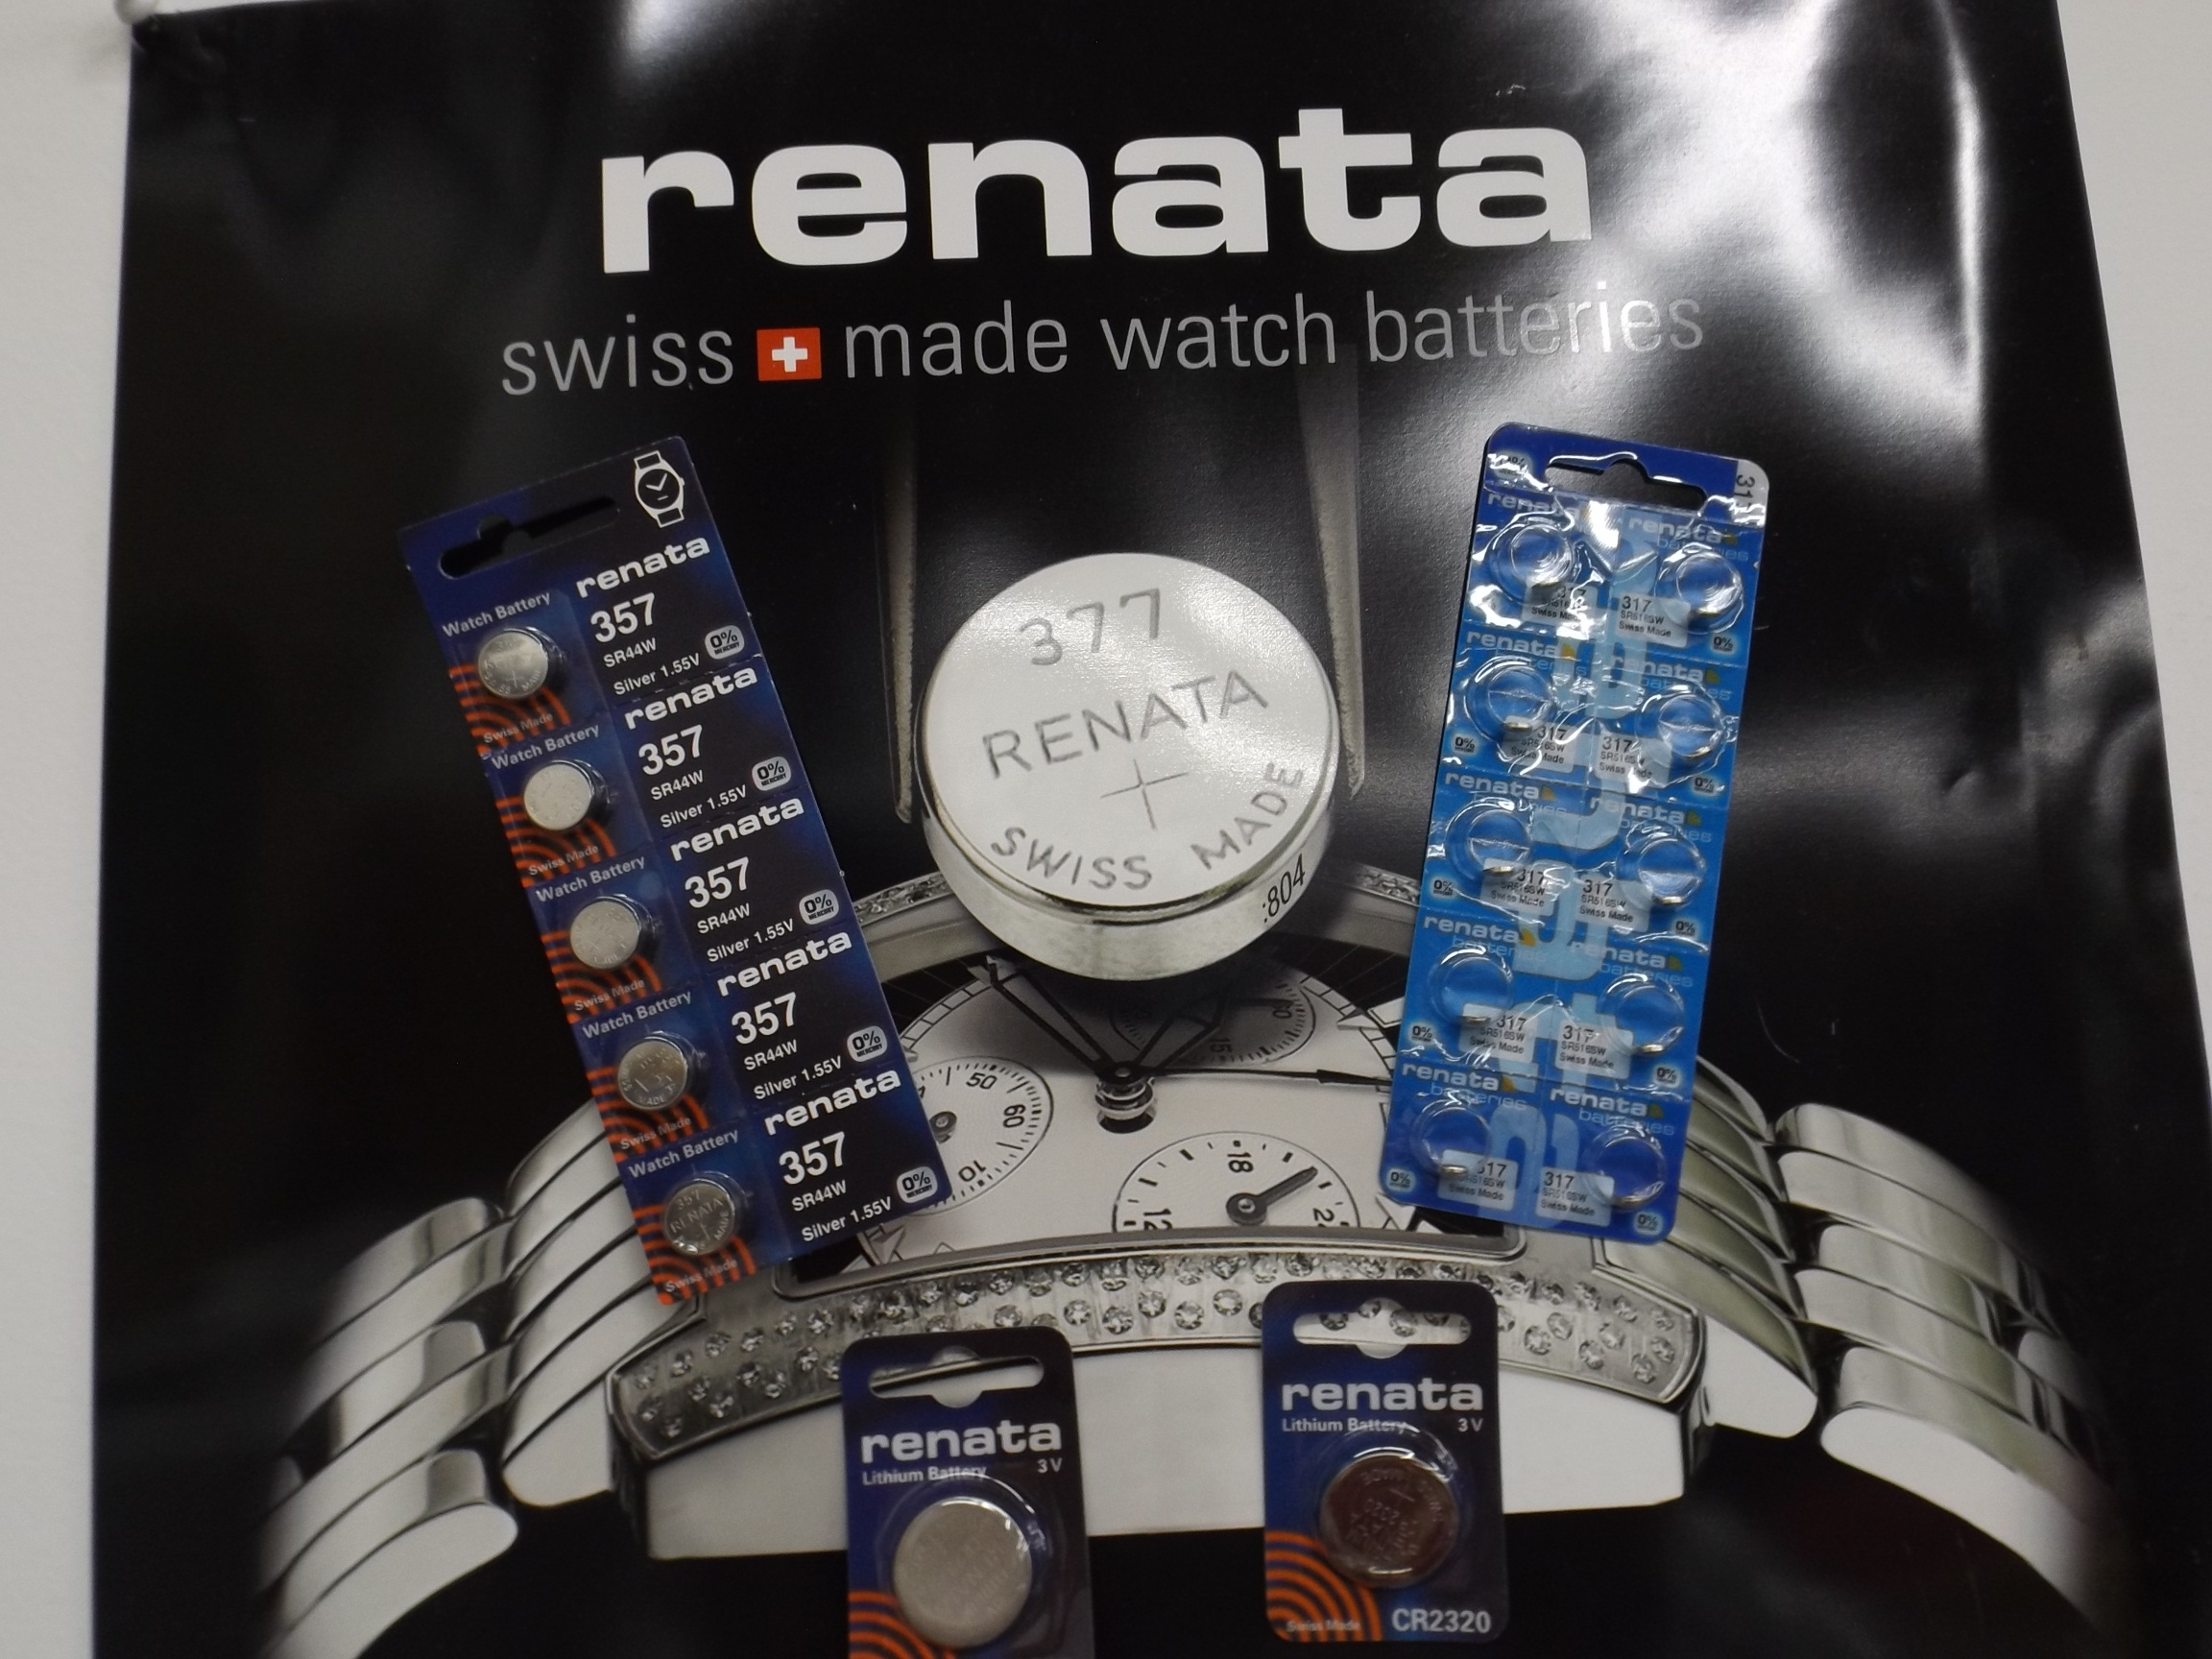 REN364 Renata Watch Batteries Multipacks, sold by 5's